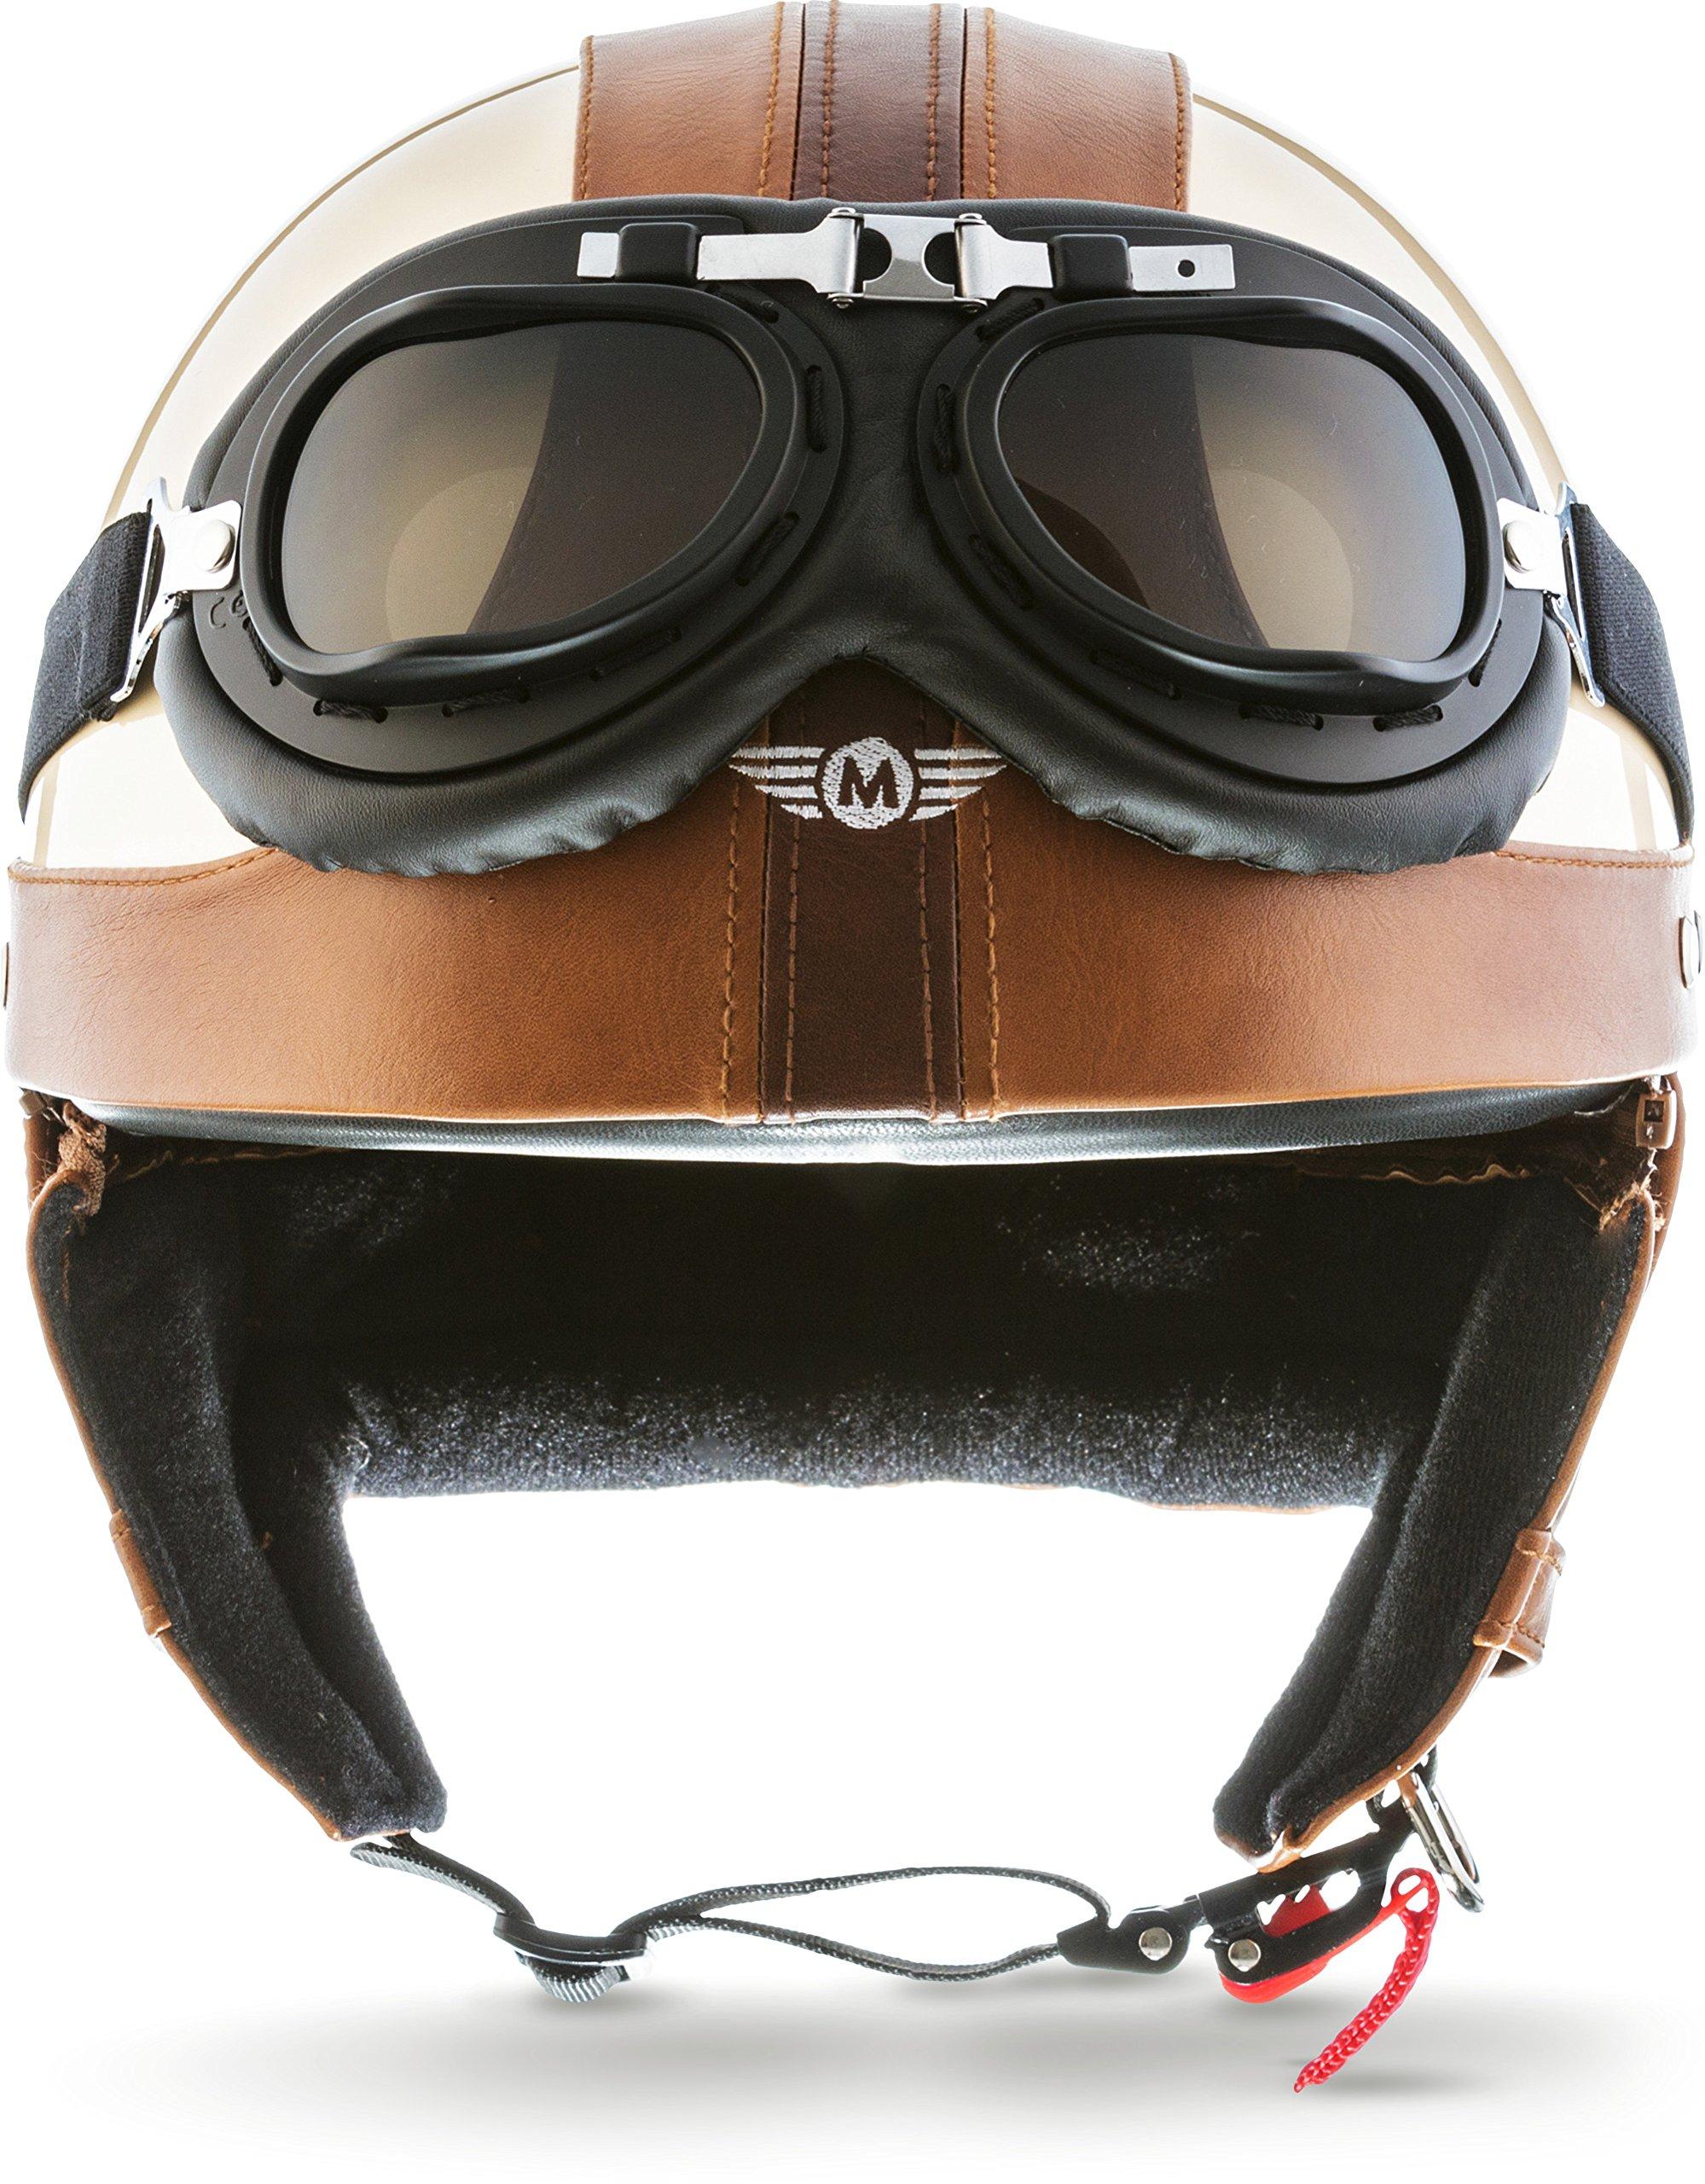 biker MOTO HELMETS D22-LEATHER roller vintage chopper casco de moto scooter cruiser BRAINCAP casco de vespa retro incluye funda de tela medio casco bobber Casco de acero